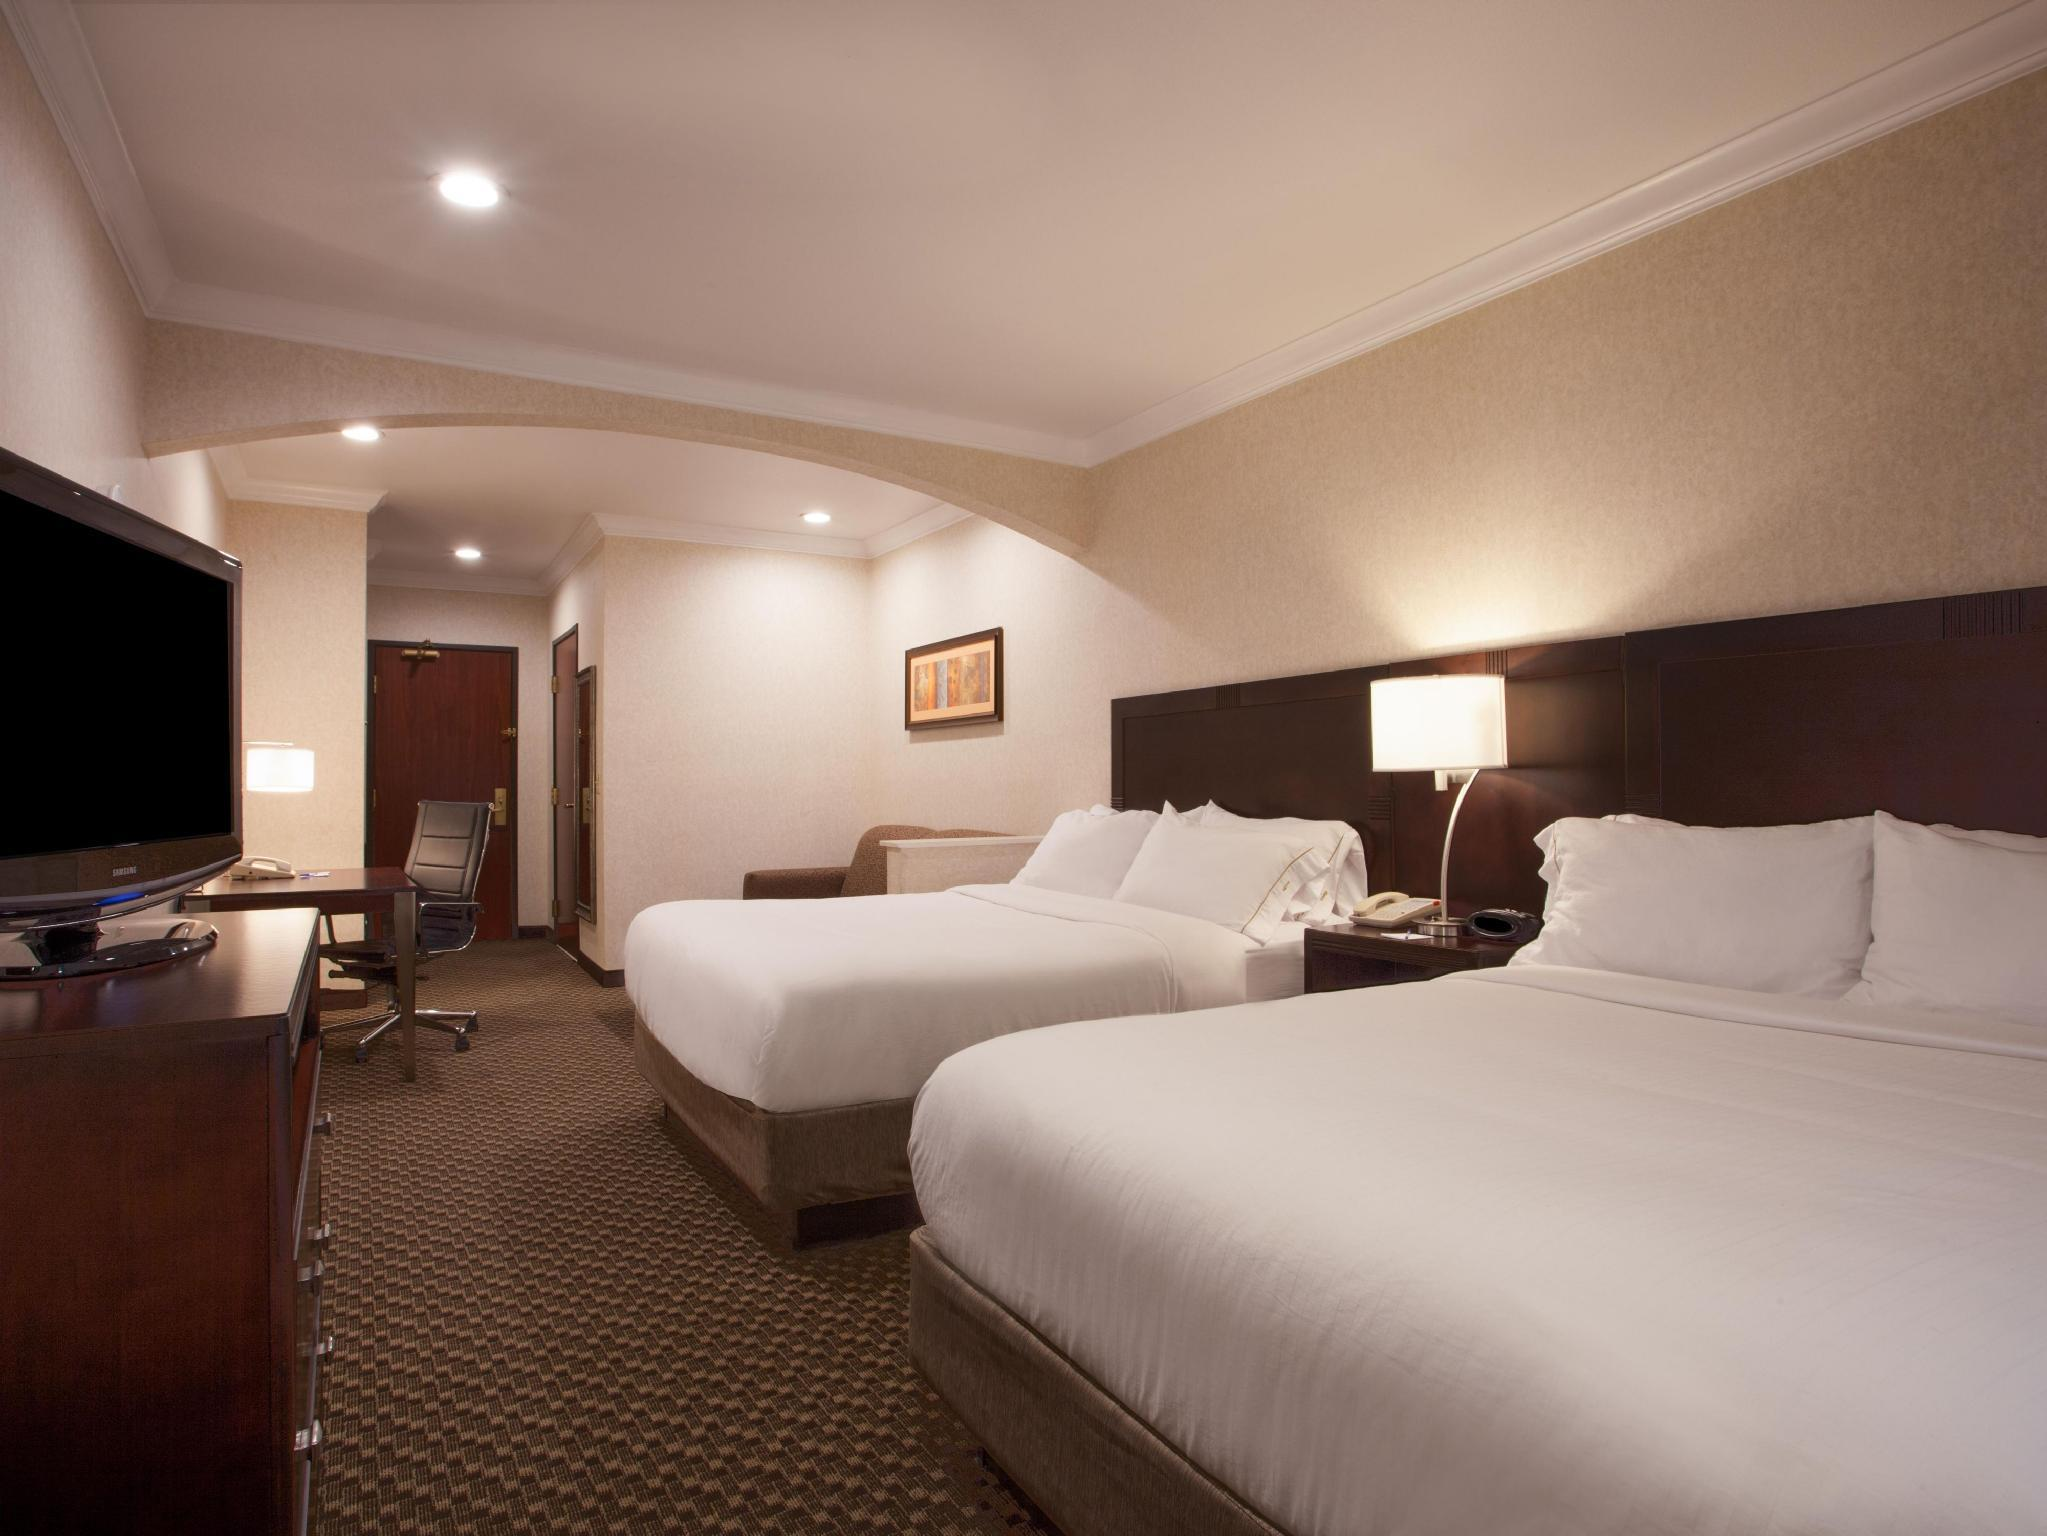 Holiday Inn Express & Suites Davis - University Area, Yolo